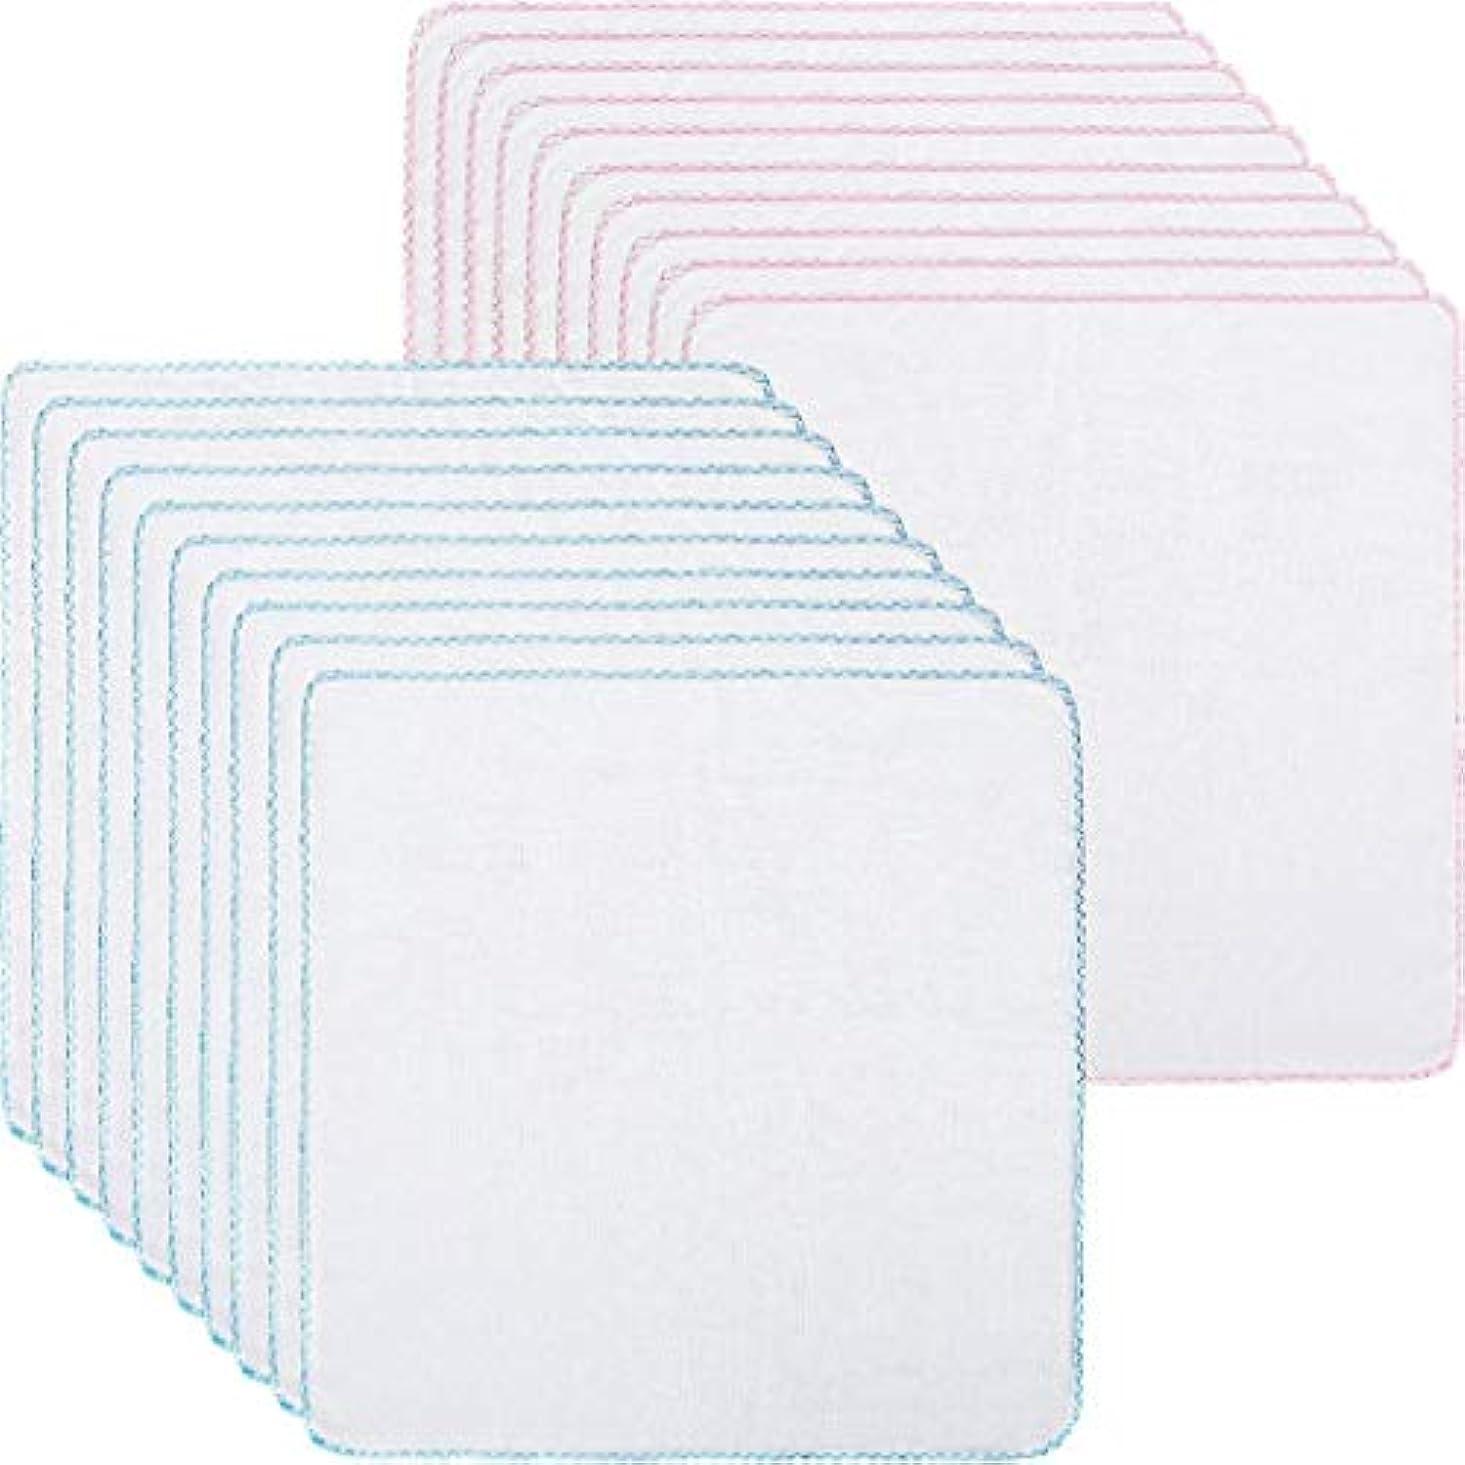 Quzama-JS 実用的な20ピースピュアコットンフェイシャルクレンジングmuslinクロスソフトフェイシャルクレンジングメイクリムーバー布、青とピンク